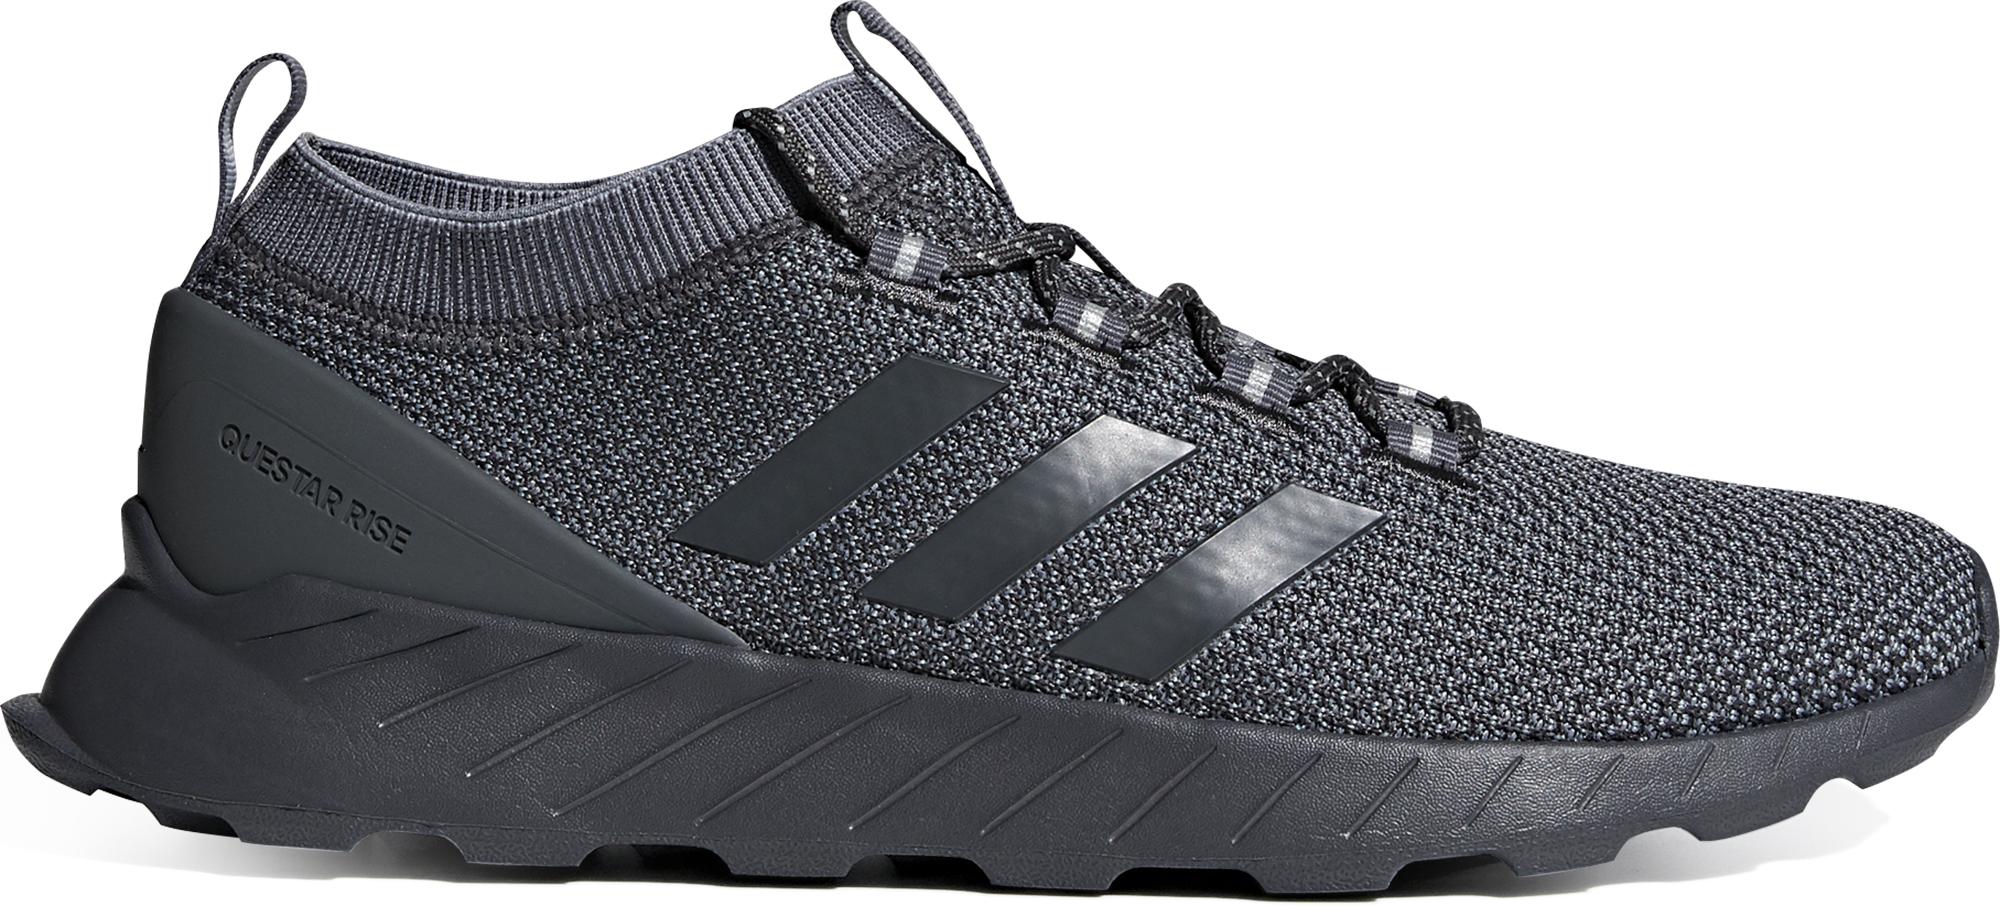 Adidas Кроссовки мужские Questar Rise, размер 44,5